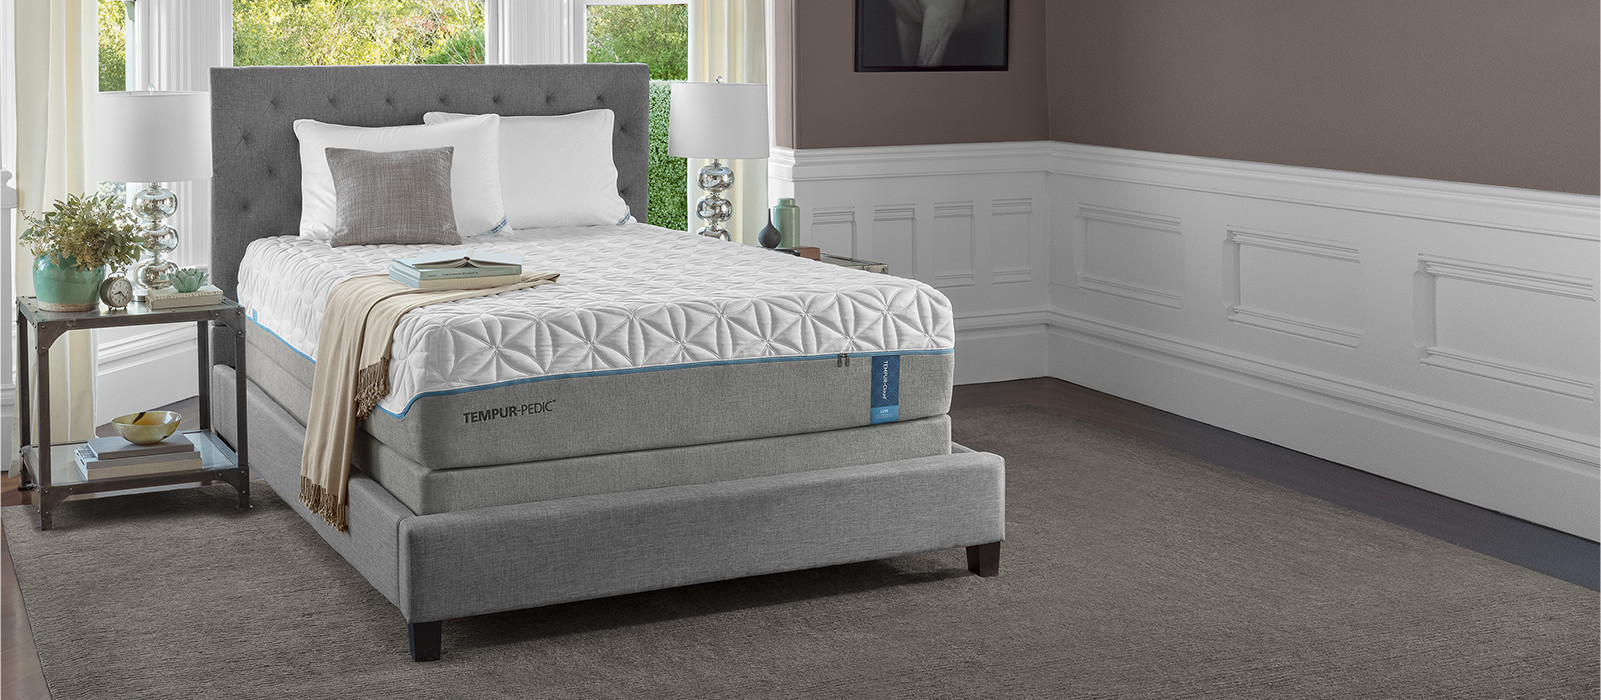 tempur cloud luxe mattress tempur pedic. Black Bedroom Furniture Sets. Home Design Ideas